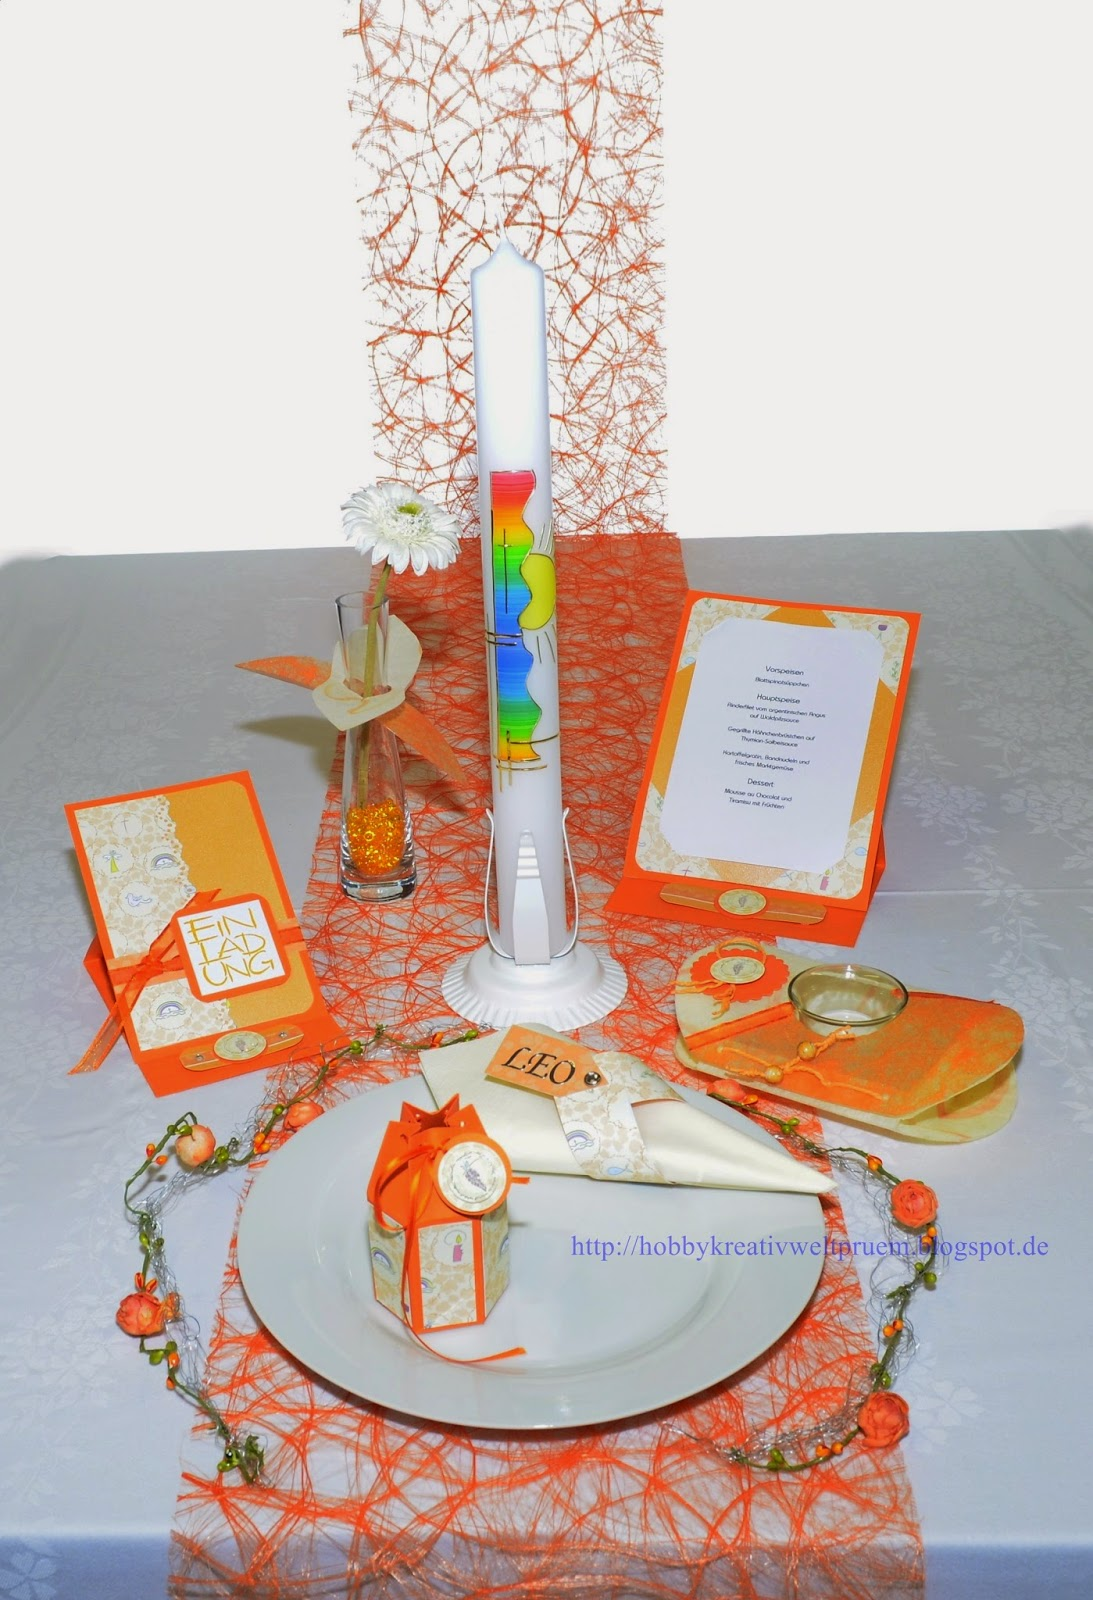 hobby kreativ welt kommunionstisch in orange. Black Bedroom Furniture Sets. Home Design Ideas